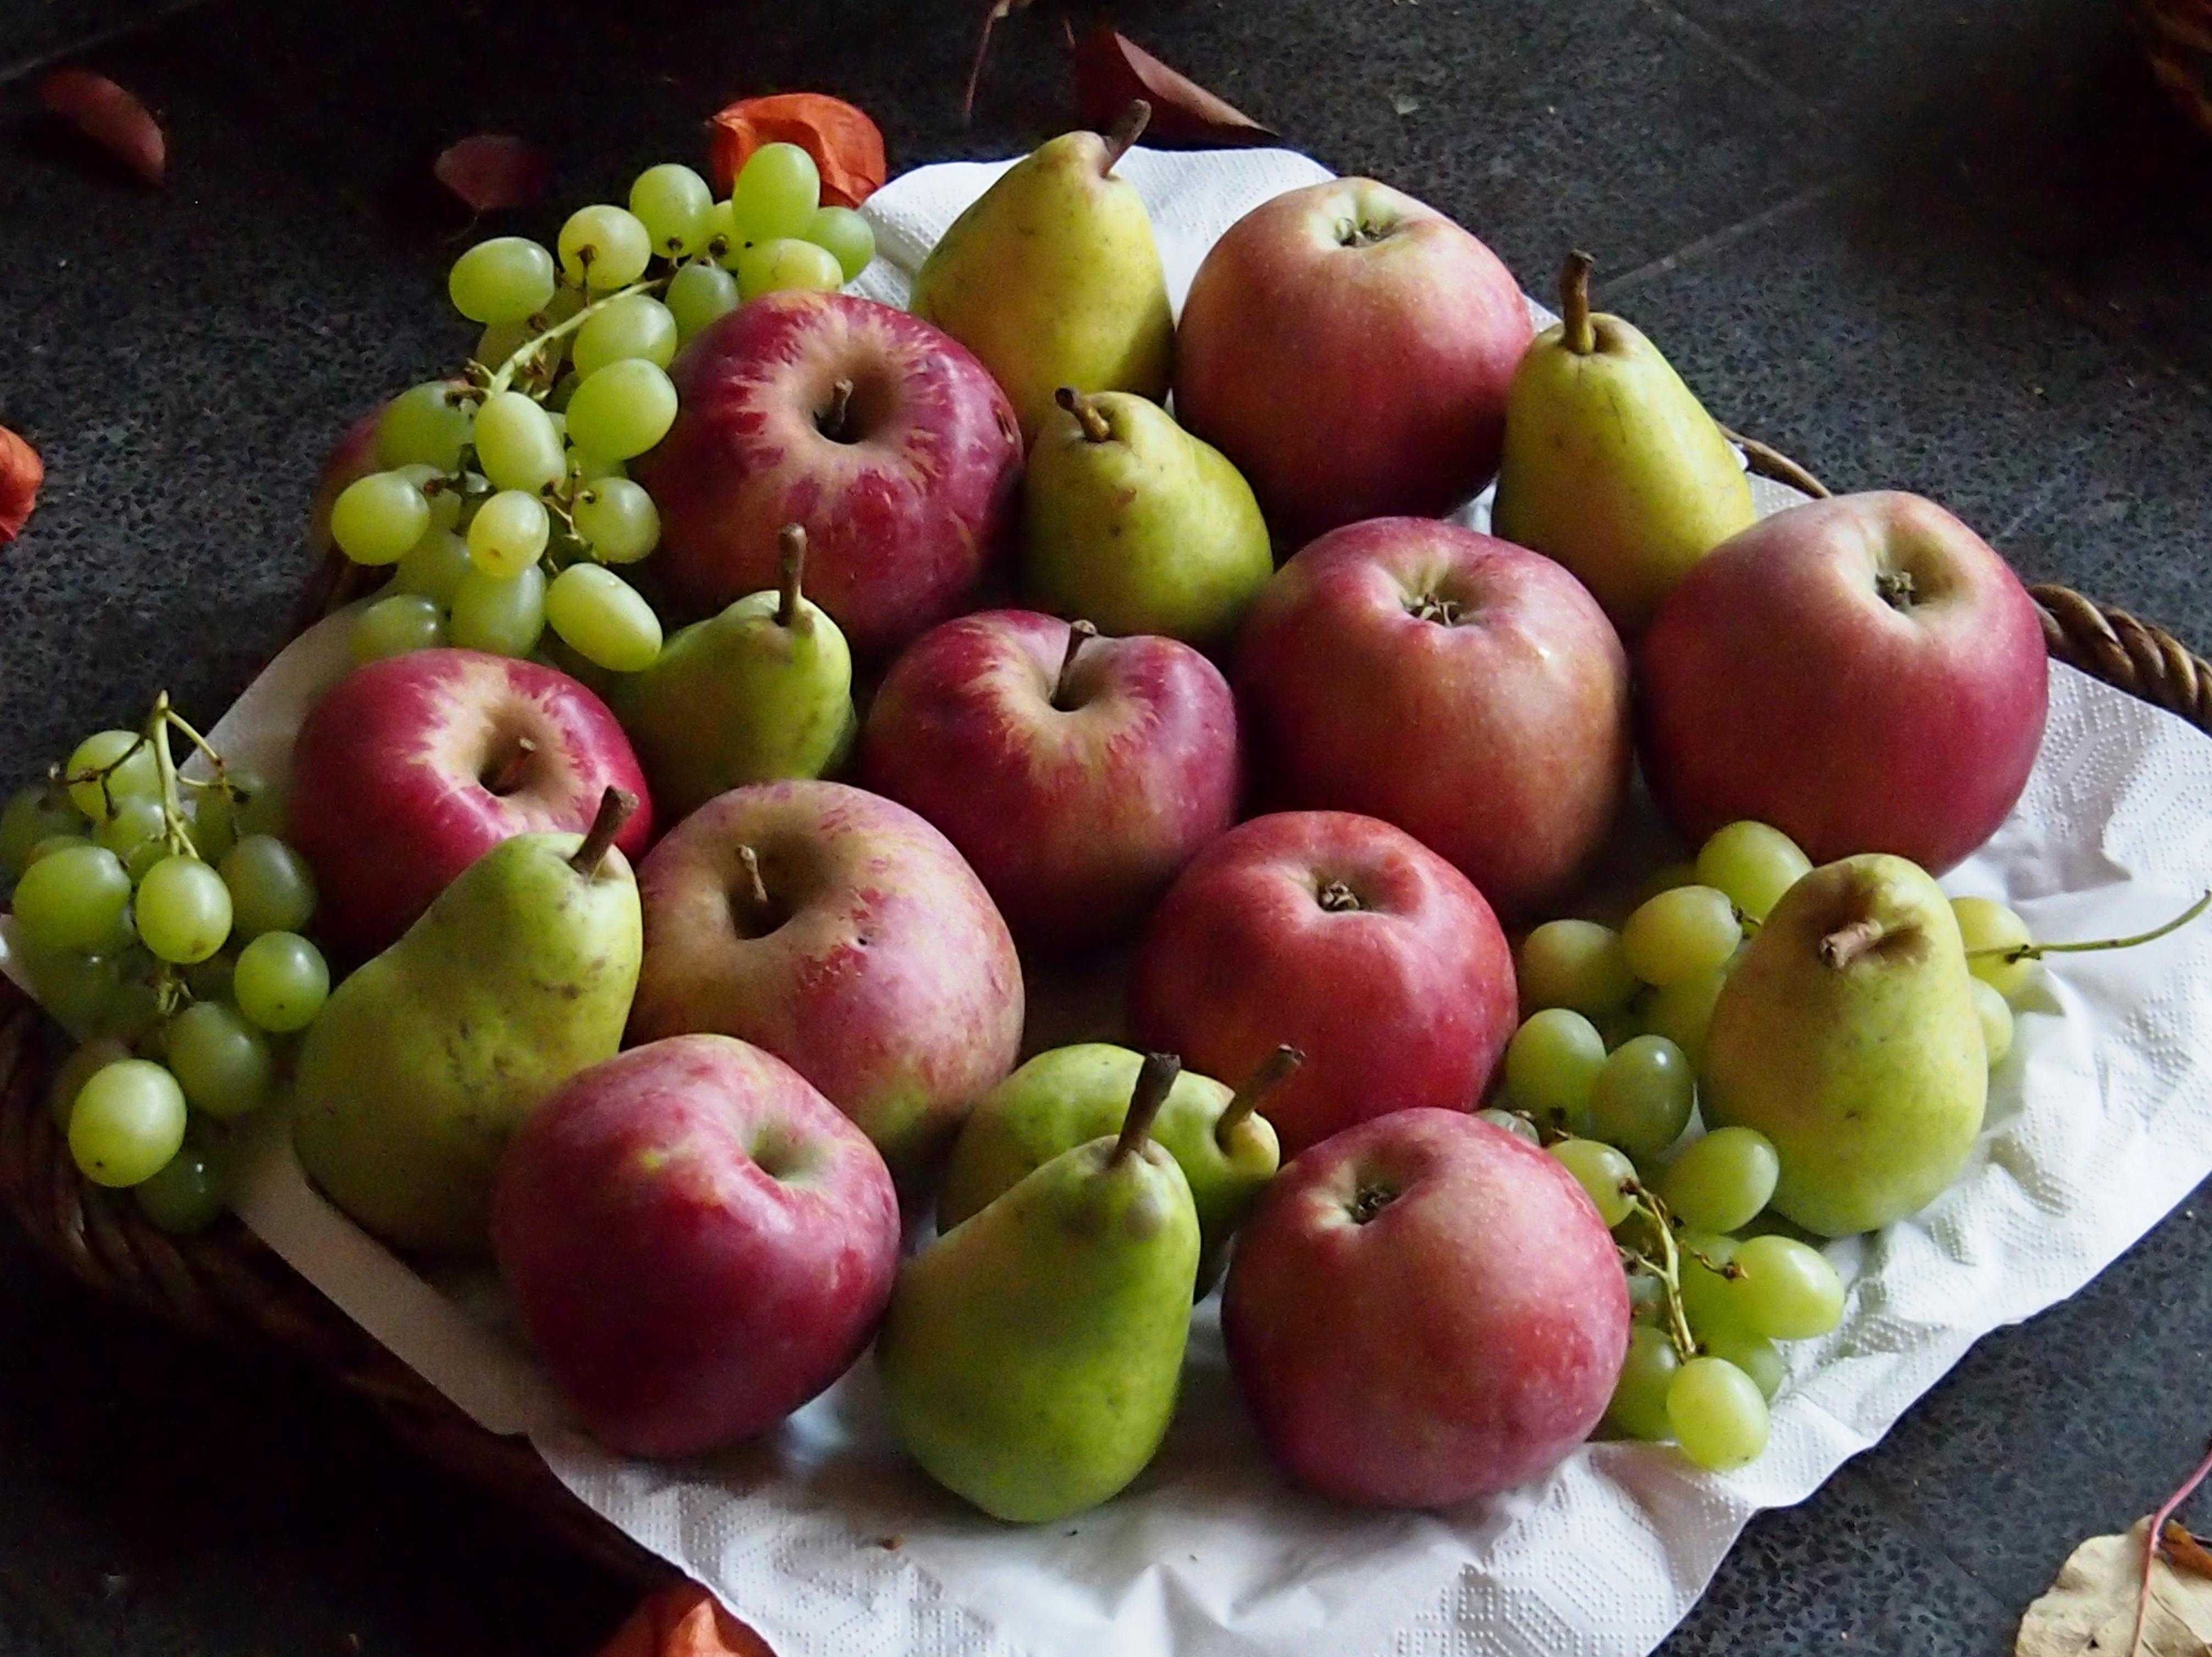 100 Gambar Apel Dan Anggur HD